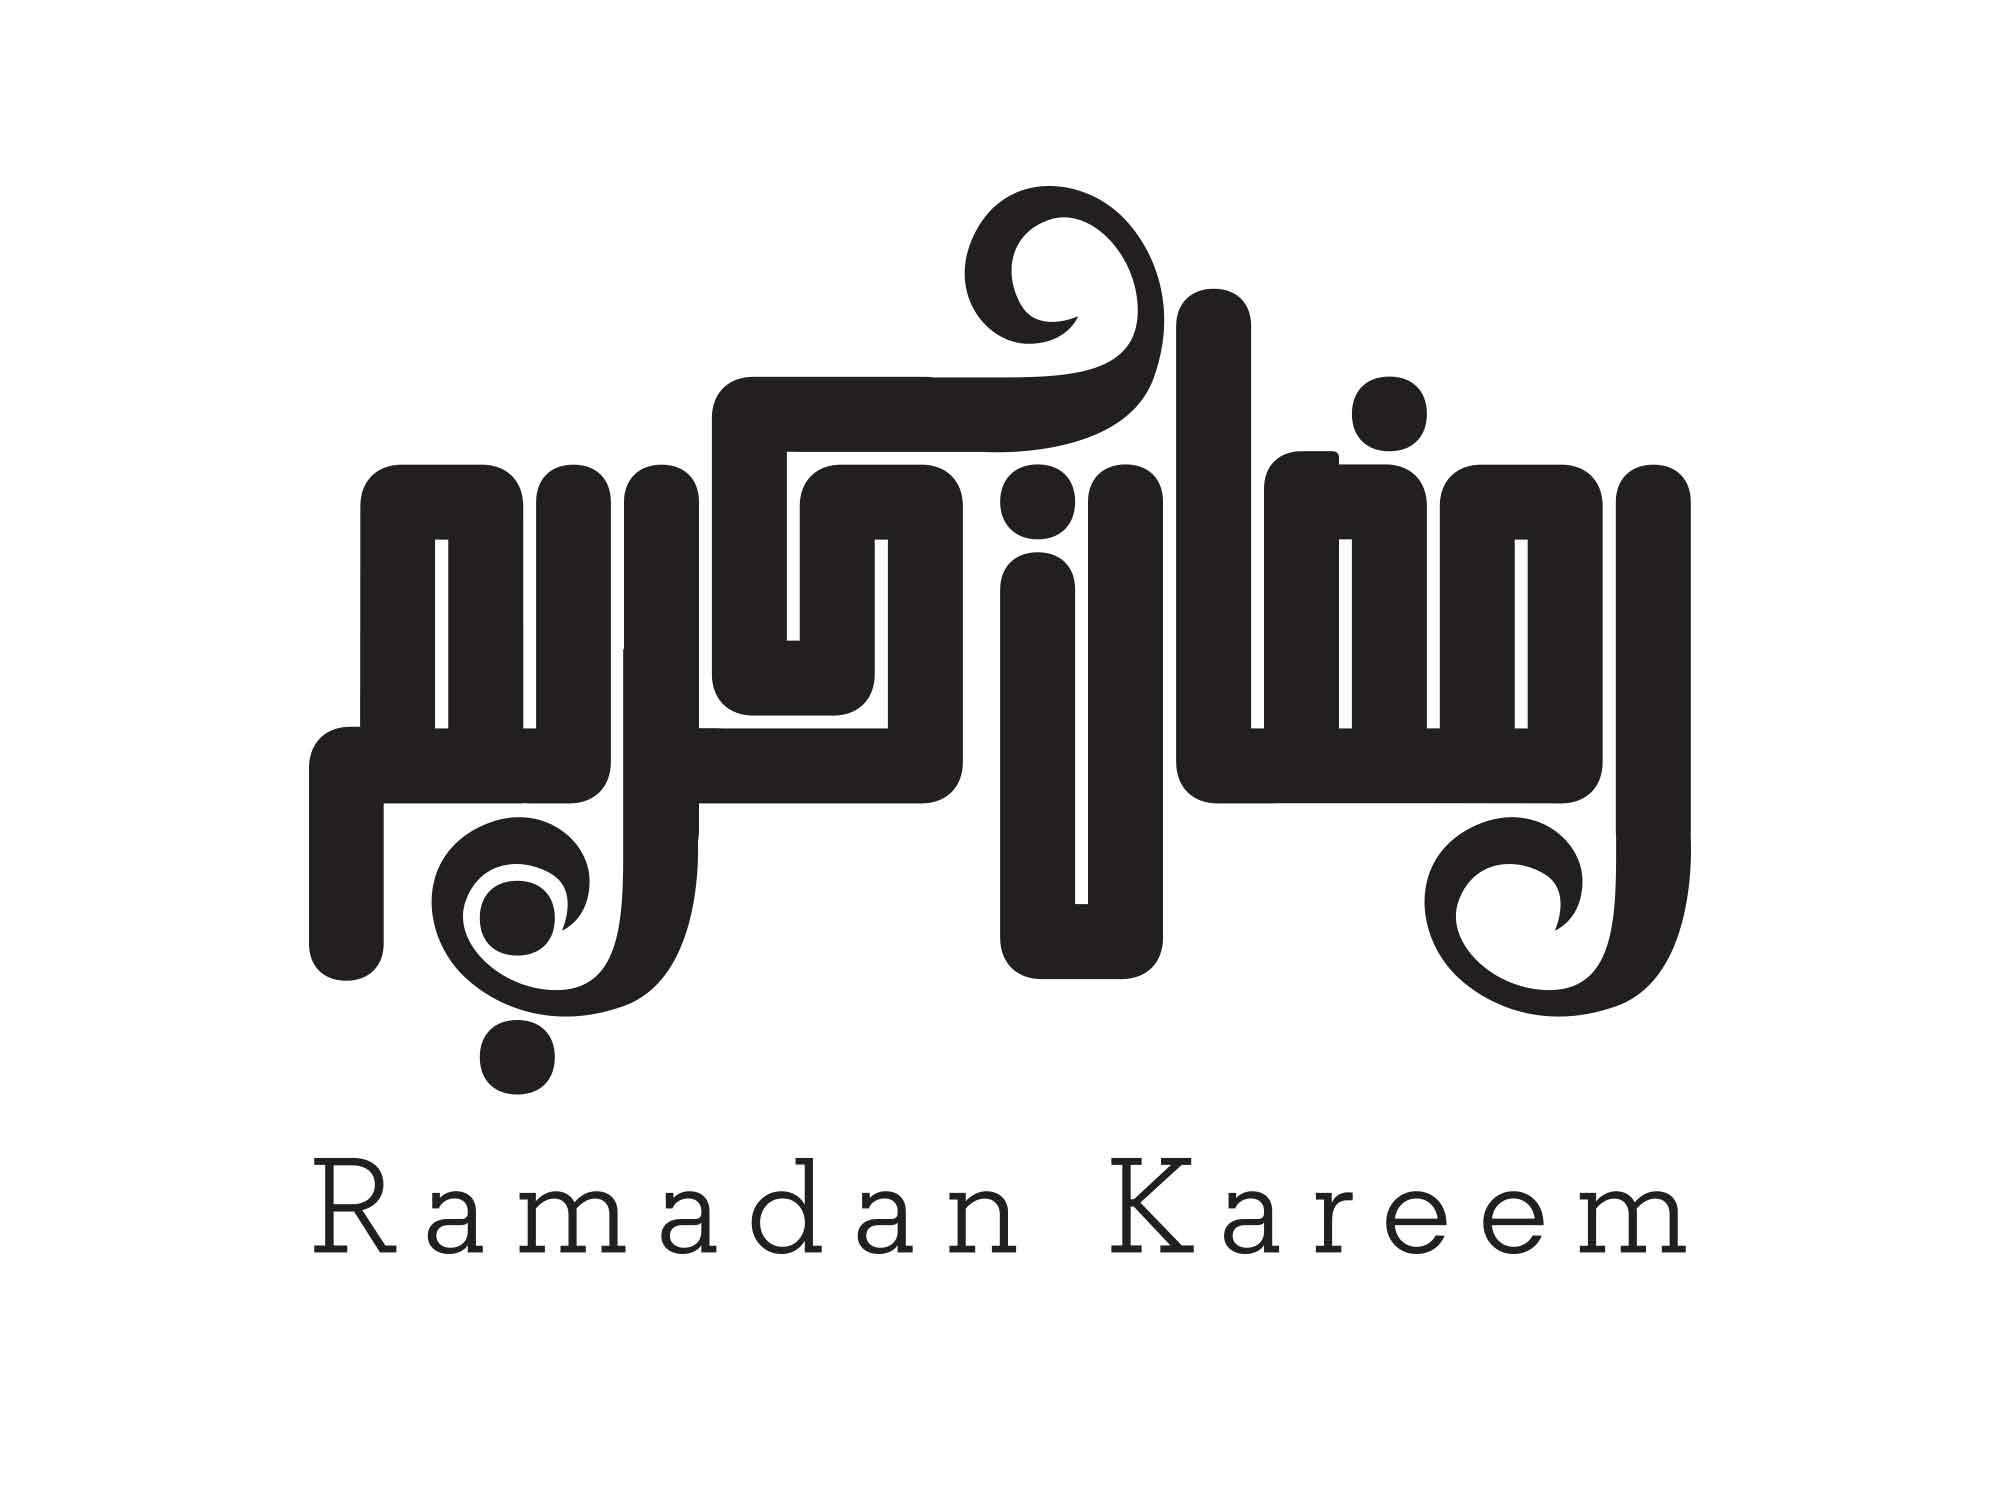 Ramadan Kareem Typography 10